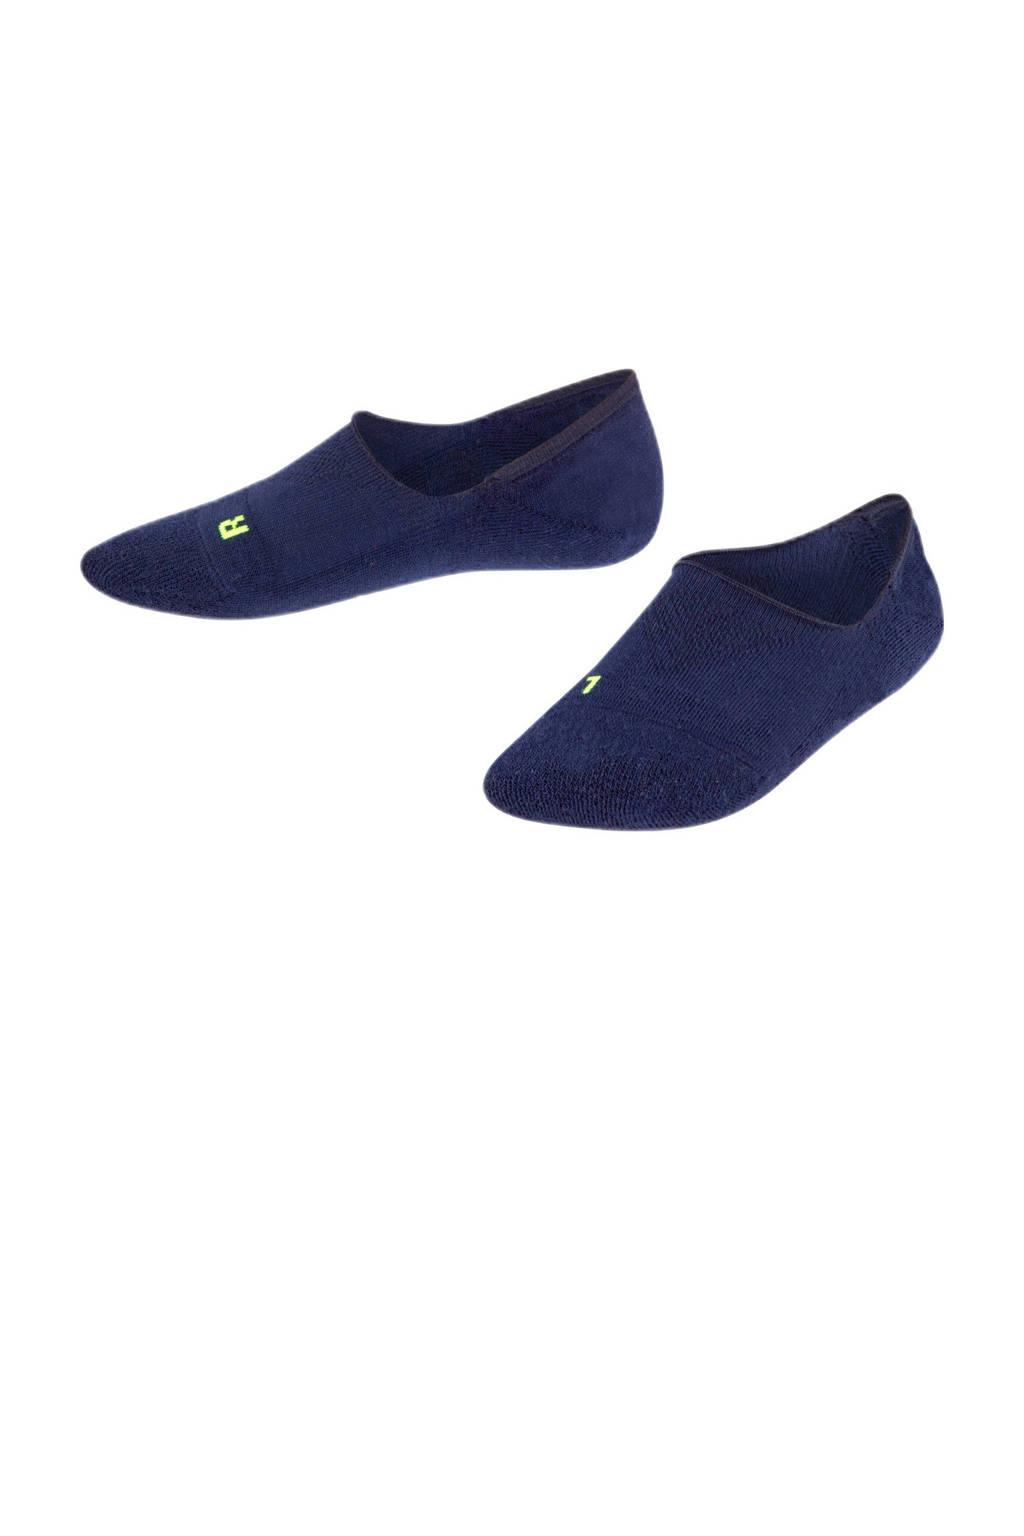 FALKE sokken marine, Marine